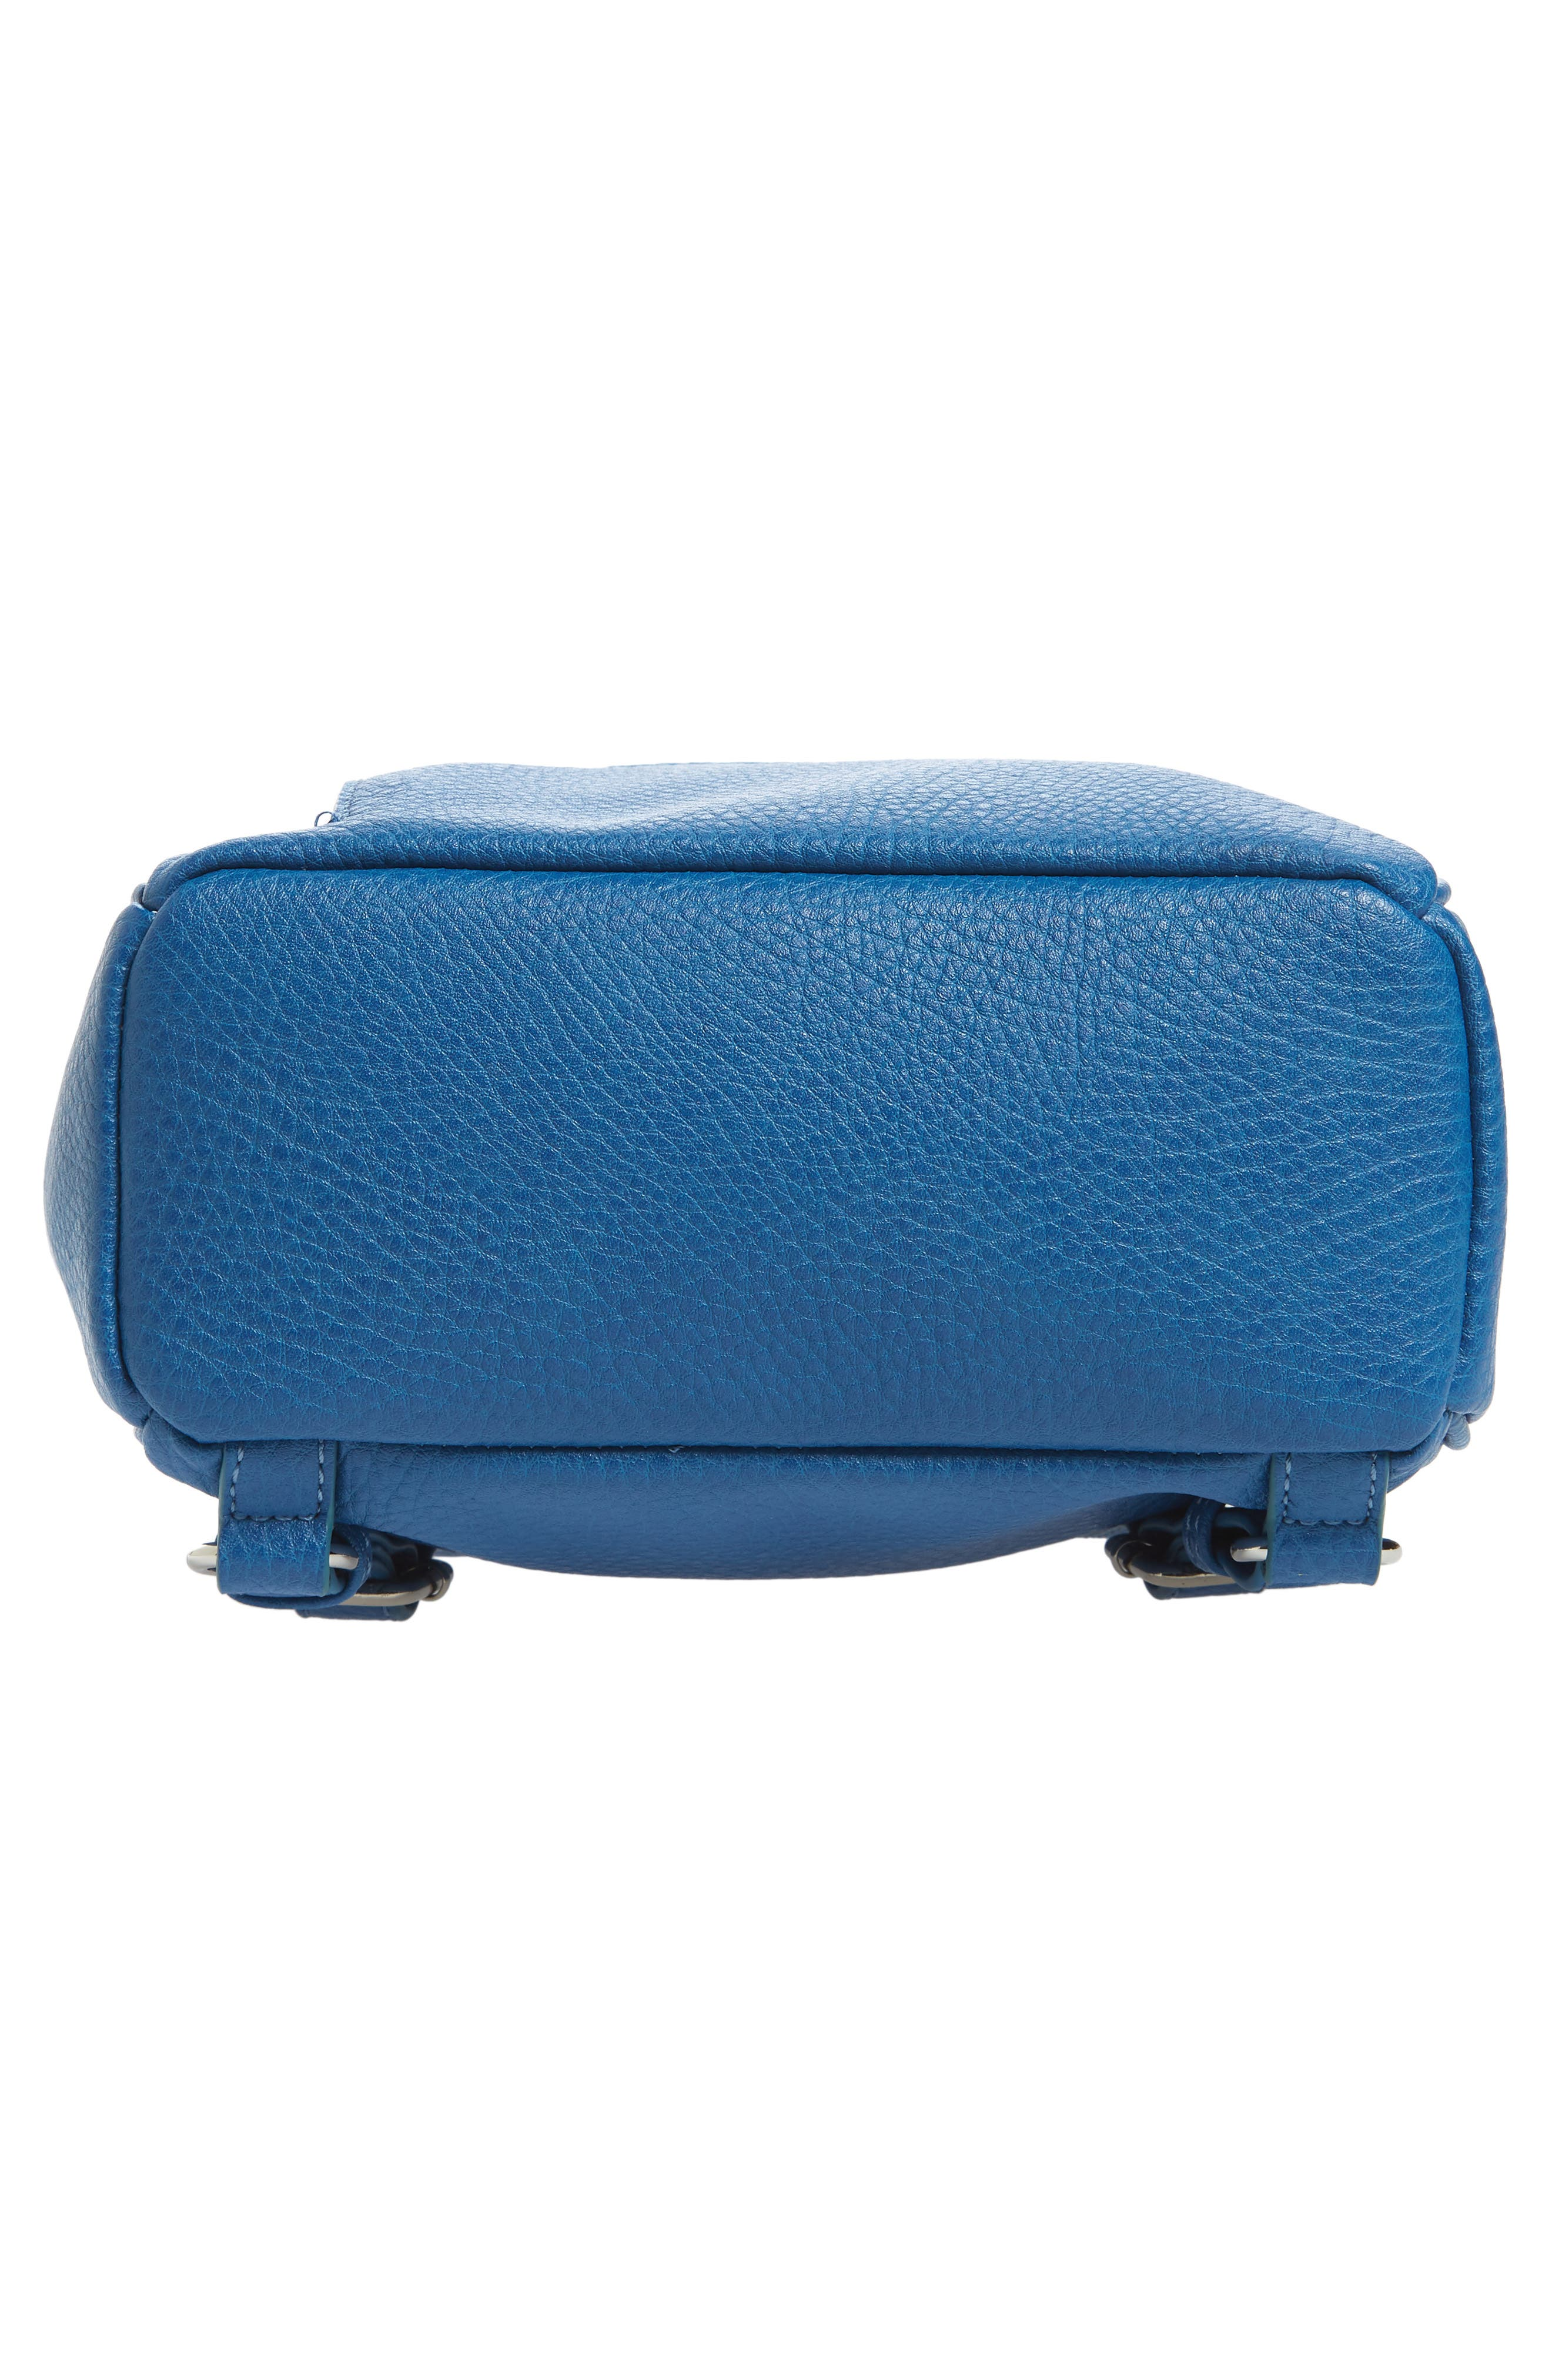 Mali + Lili Hannah Vegan Leather Backpack,                             Alternate thumbnail 6, color,                             FRENCH BLUE